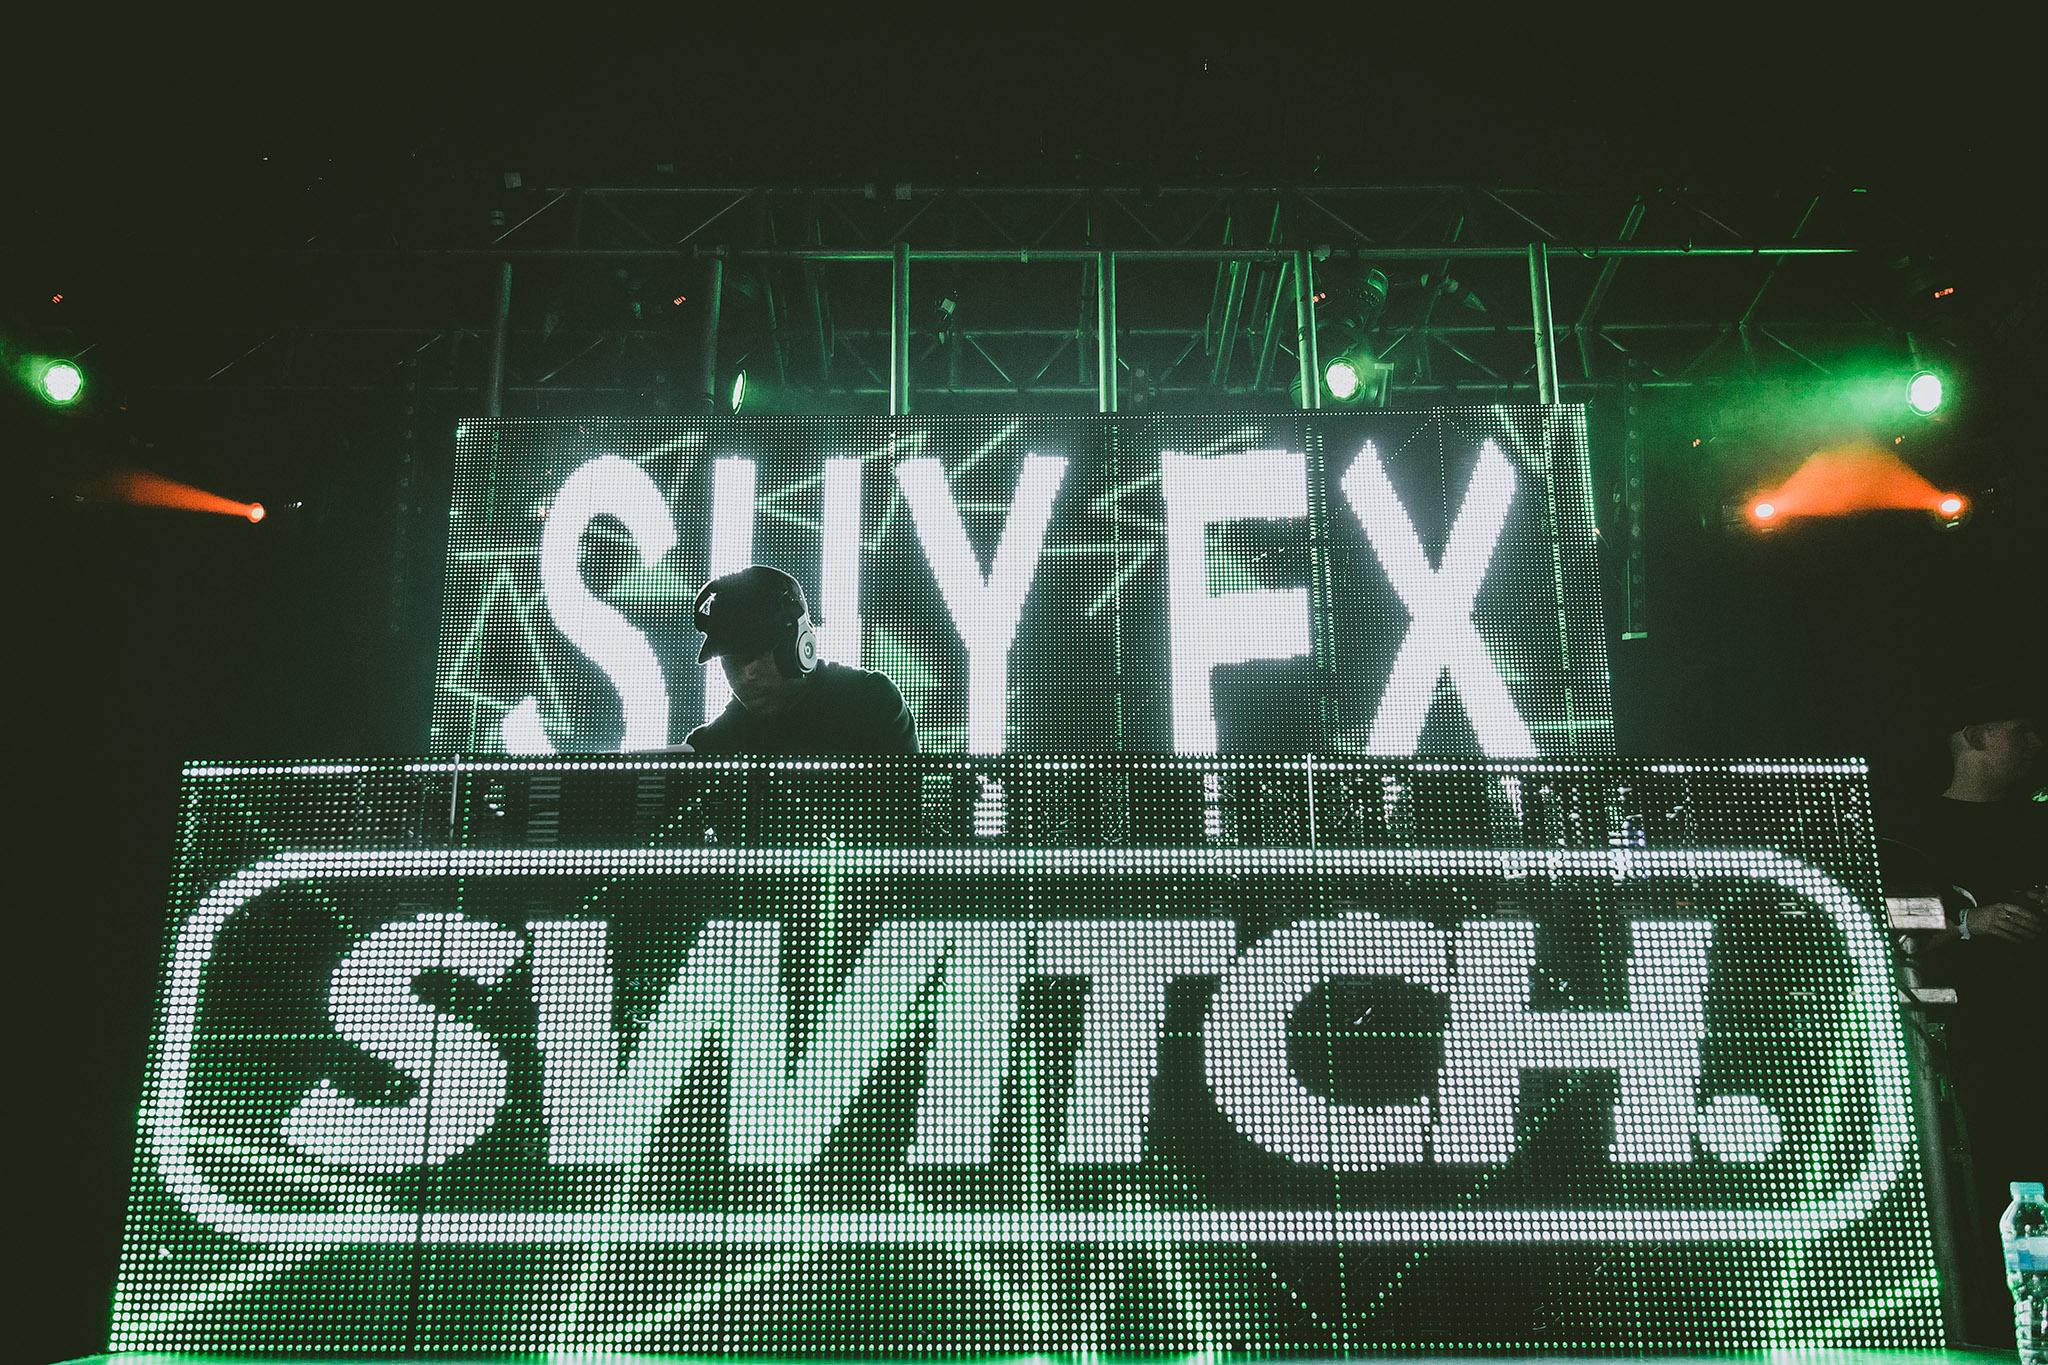 switch-photography-26.jpg